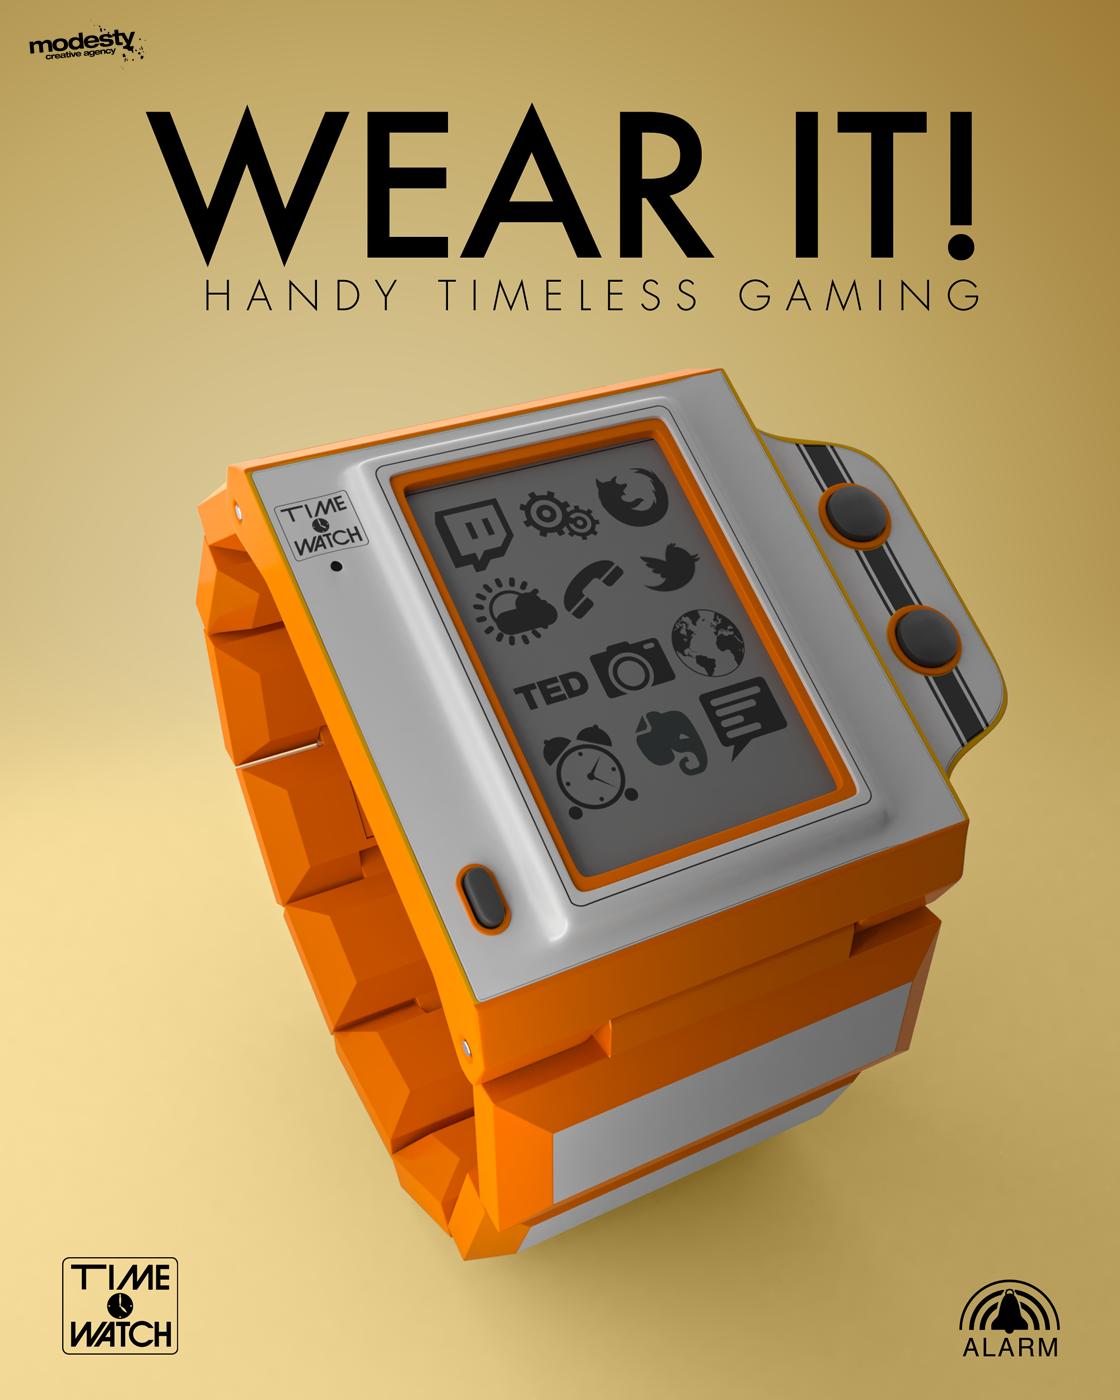 Retro amiga commodore 64 atari mobile Amiga 500 C64 pad headphone watch smart watch